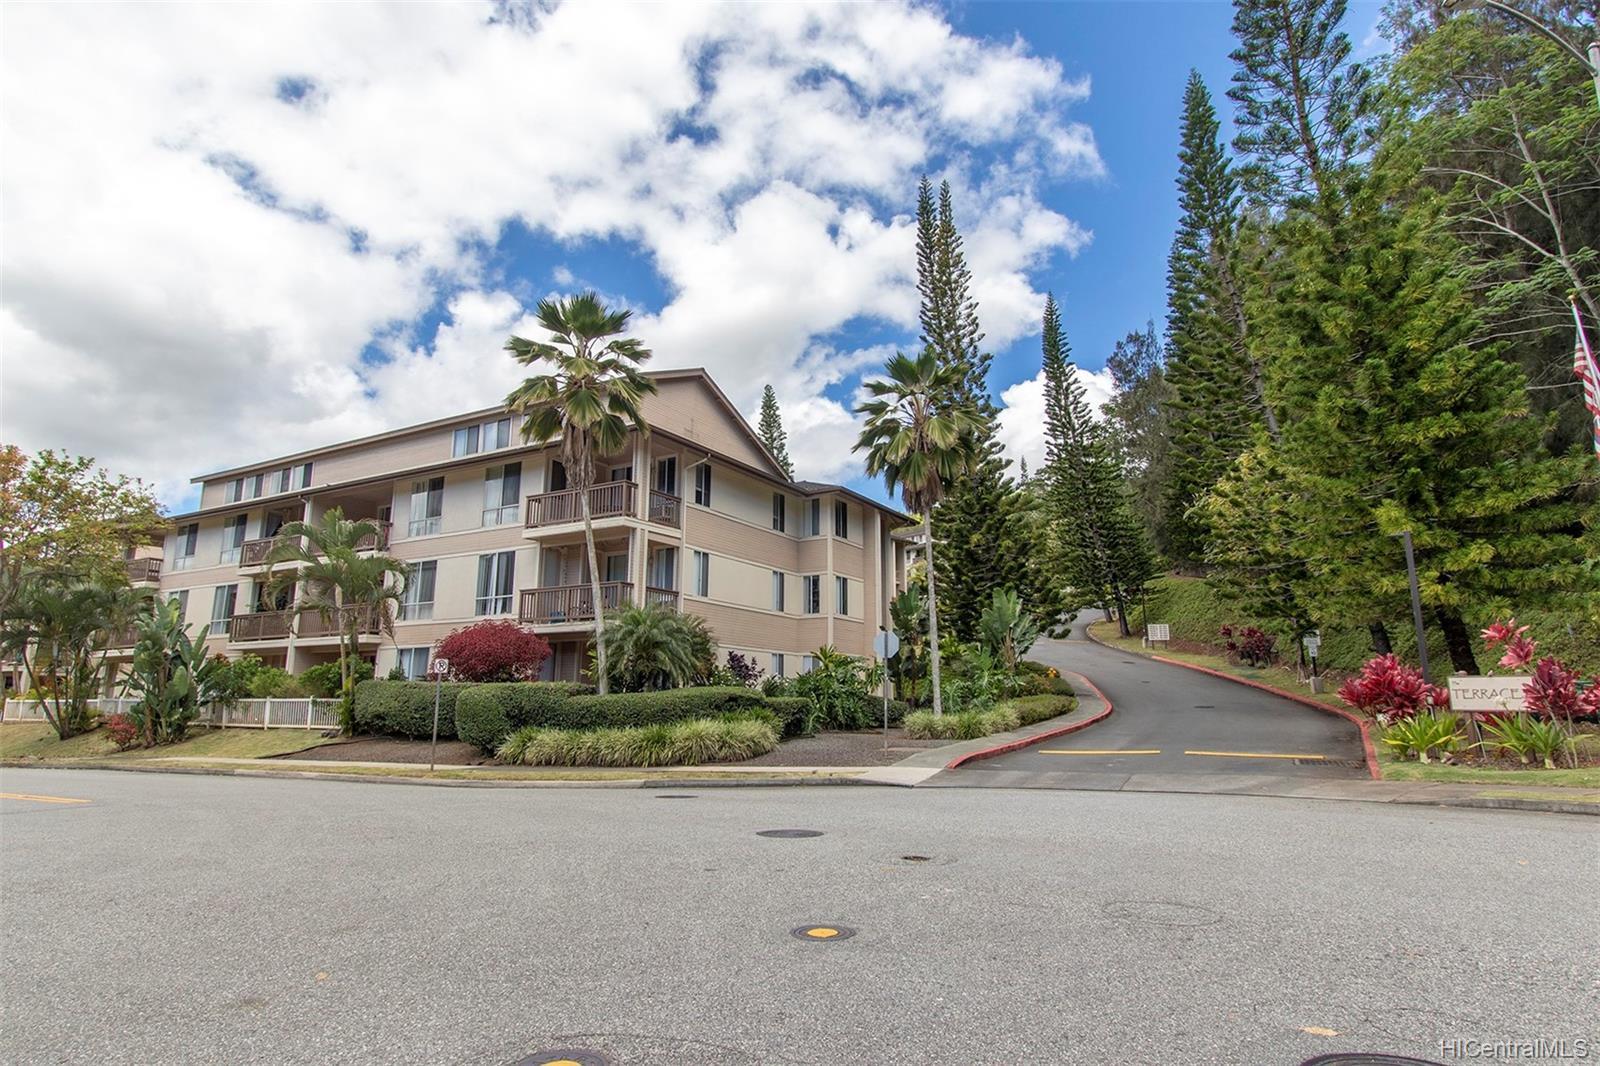 95-982 Wikao Street townhouse # L102, Mililani, Hawaii - photo 20 of 23